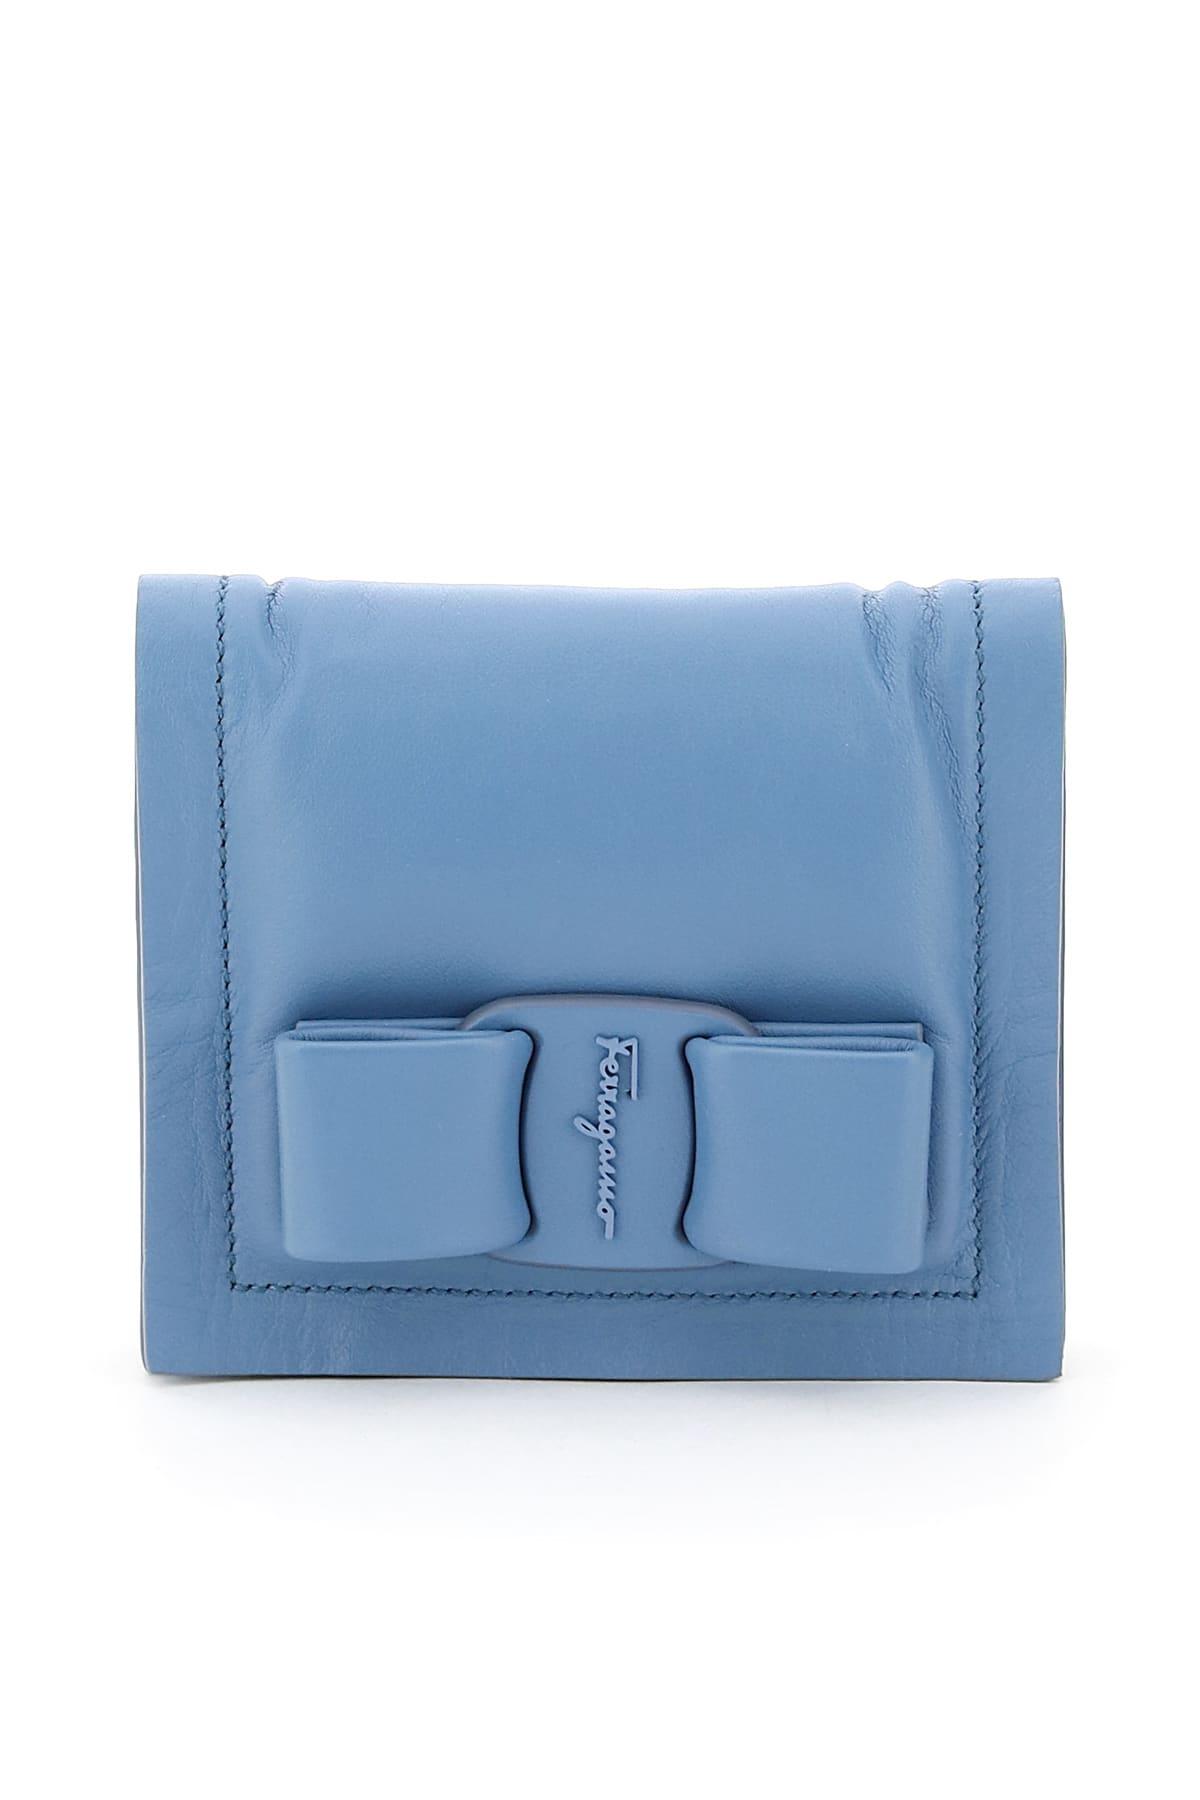 Salvatore Ferragamo Viva Bow Compact Wallet